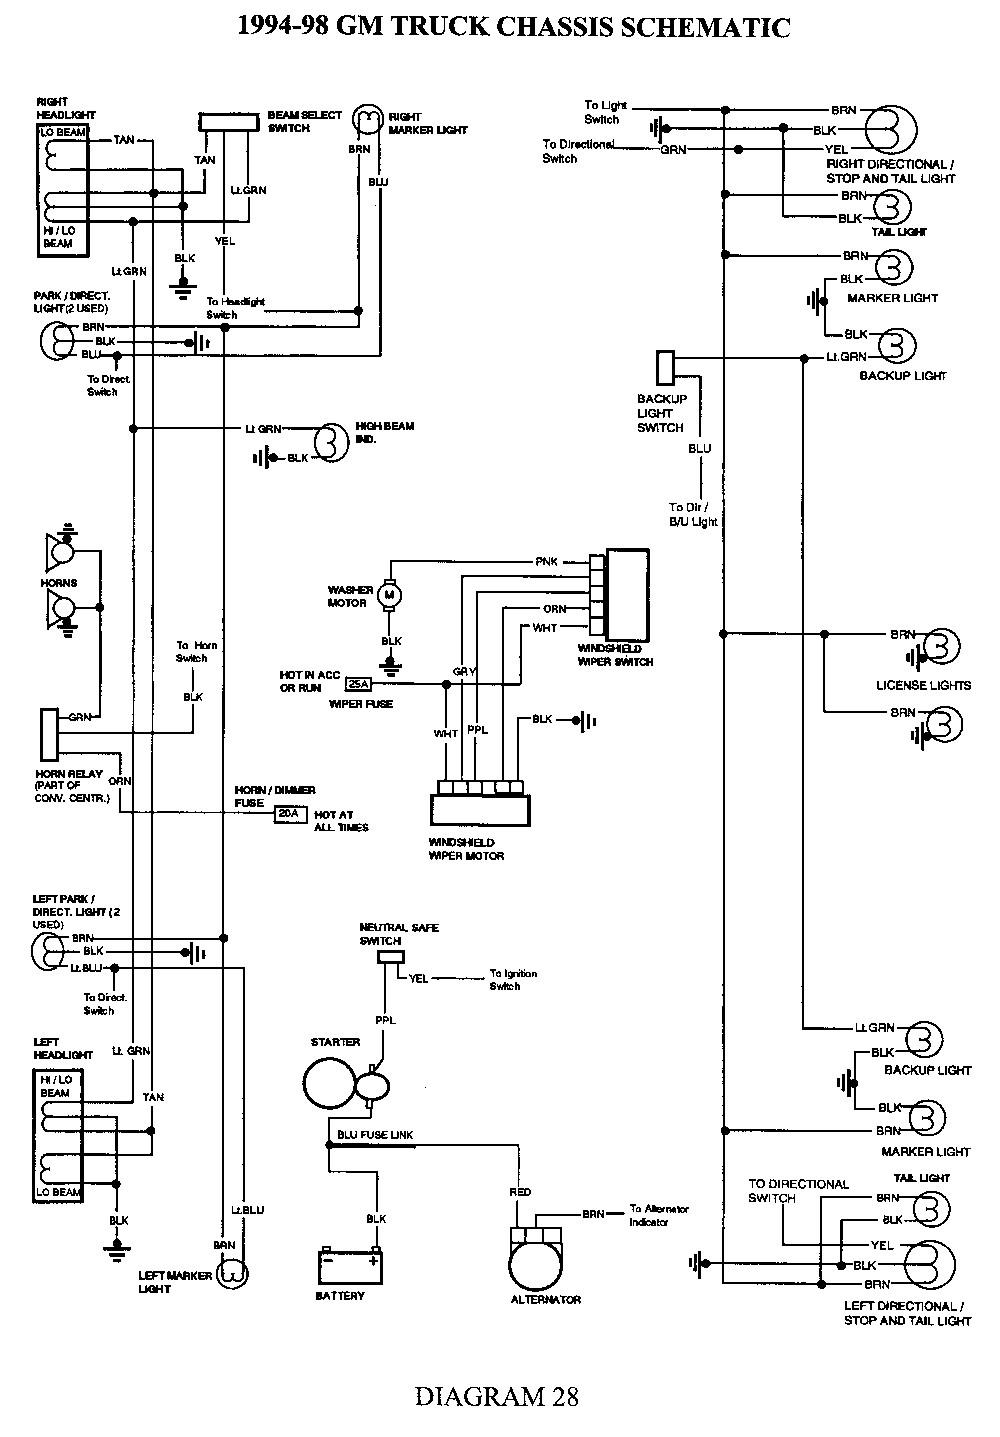 1994 Chevy Truck Brake Light Wiring Diagram - 1994 Chevy Truck Brake Light Wiring Diagram Download Brake Light Wiring Diagram Chevy Collection Fig 12t